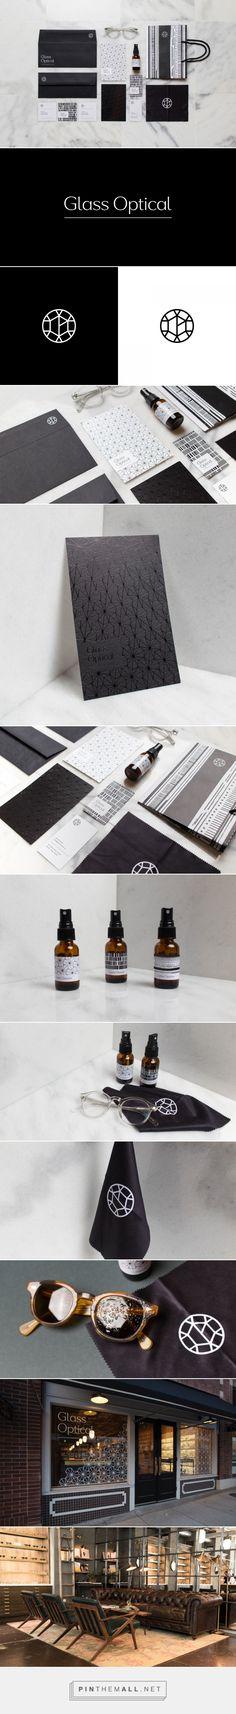 Glass Optical | Mast | Fivestar Branding – Design and Branding Agency & Inspiration Gallery